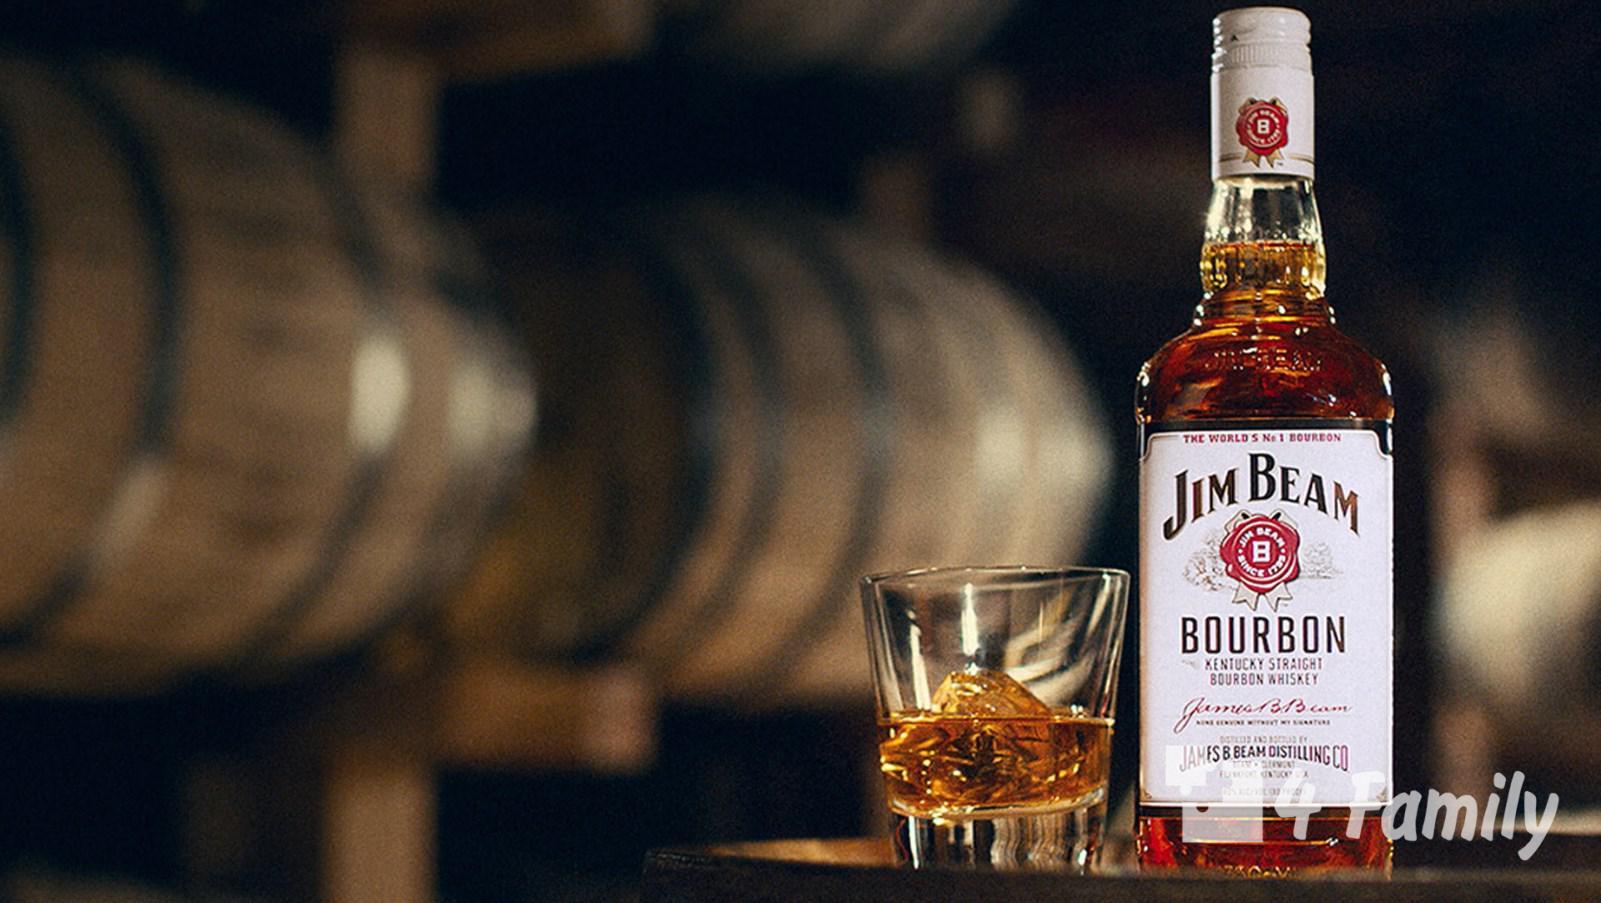 4family Как пить бурбон Jim Beam